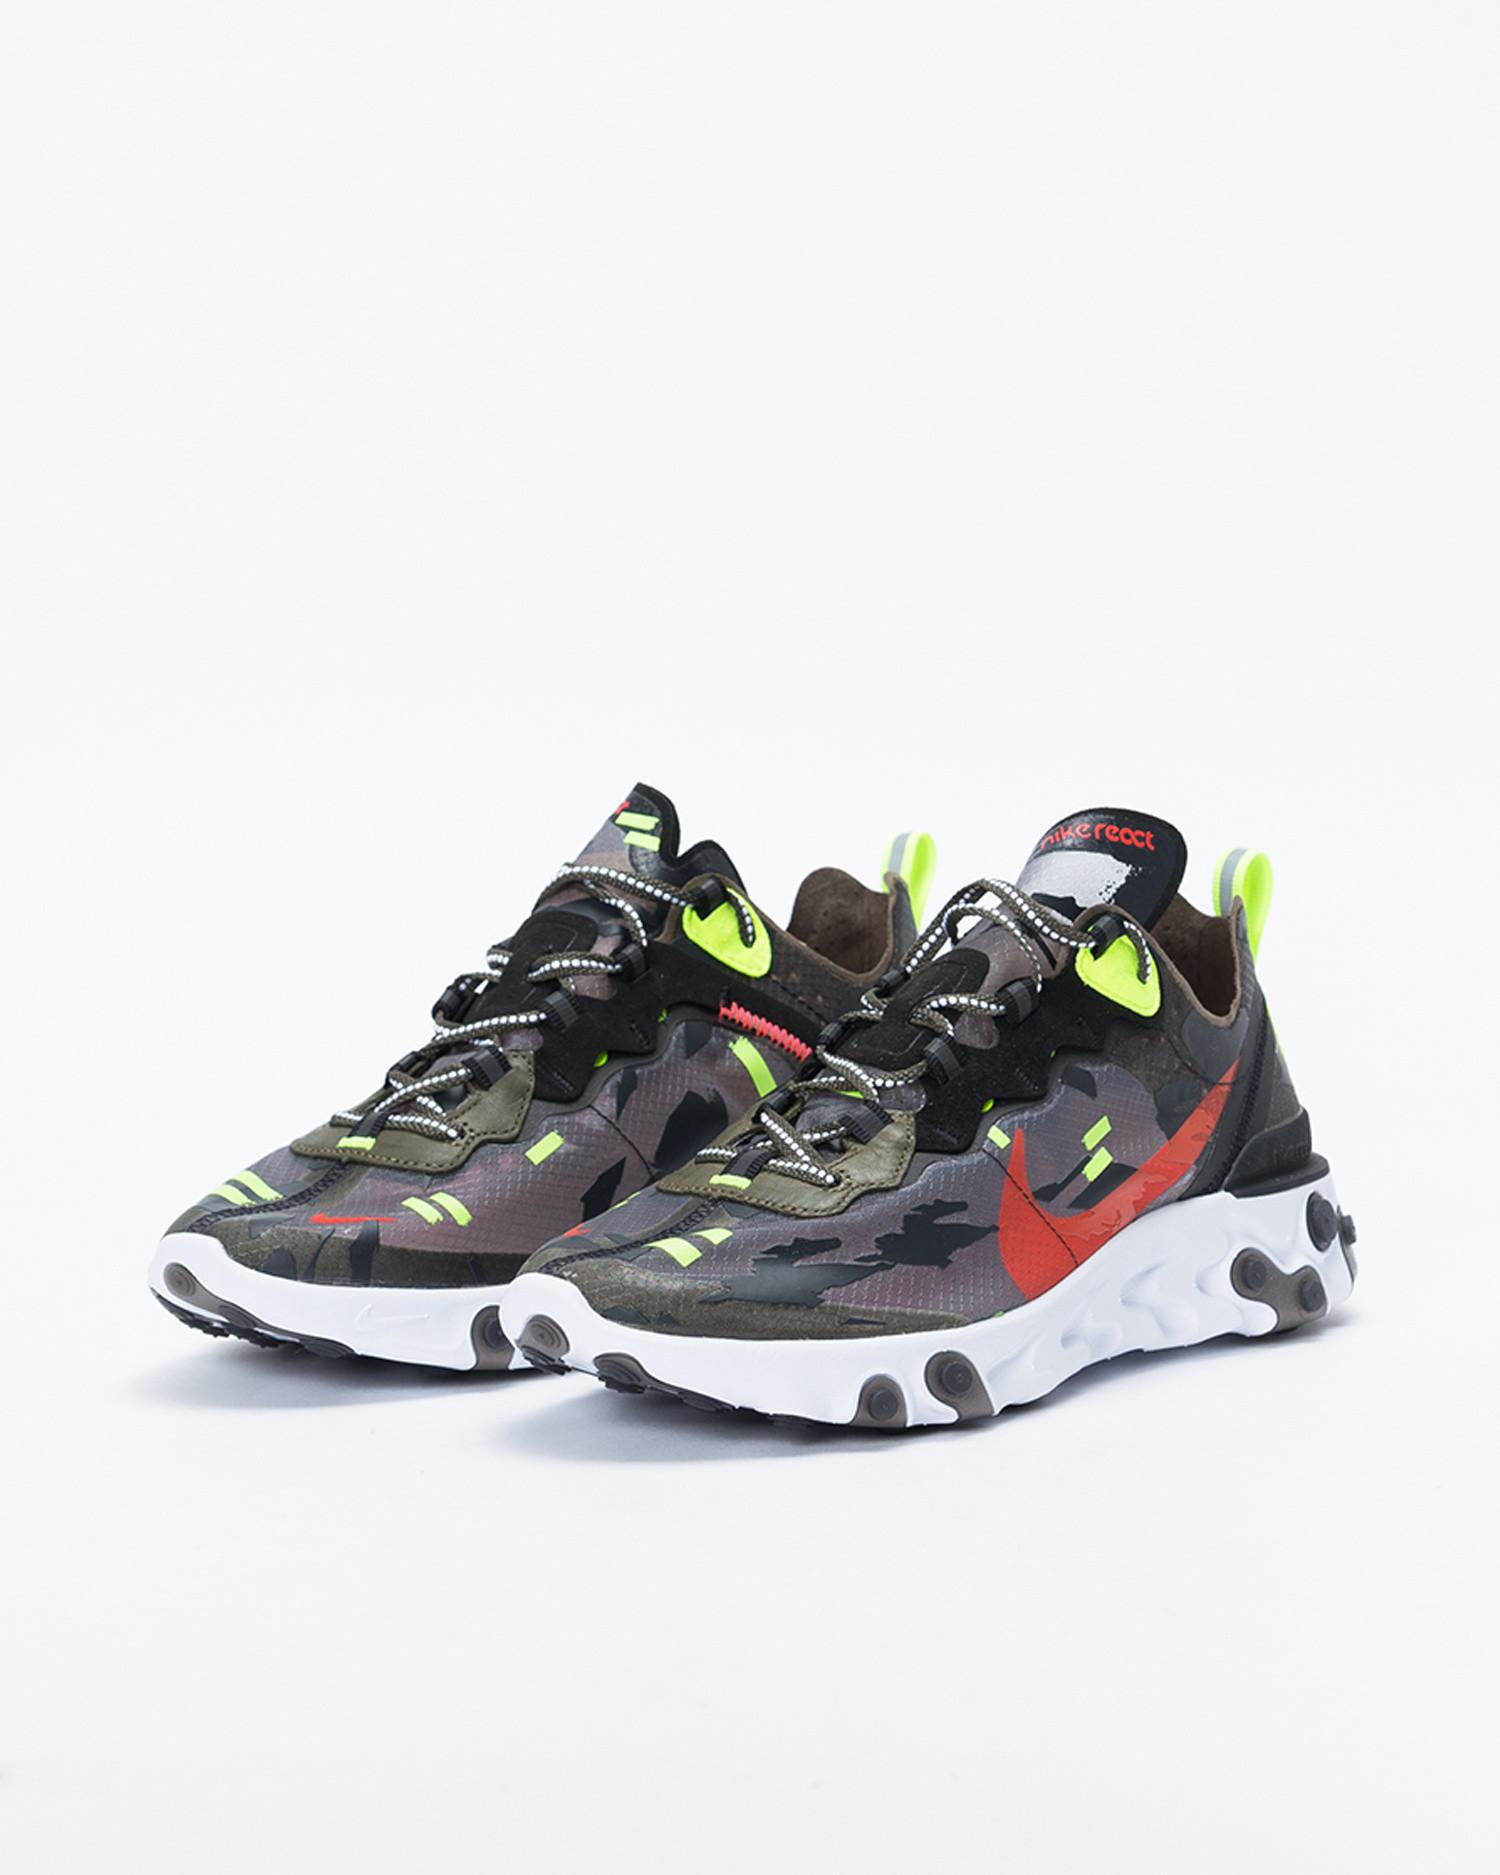 Nike React Element 87 Medium olive/bright crimson-black-volt